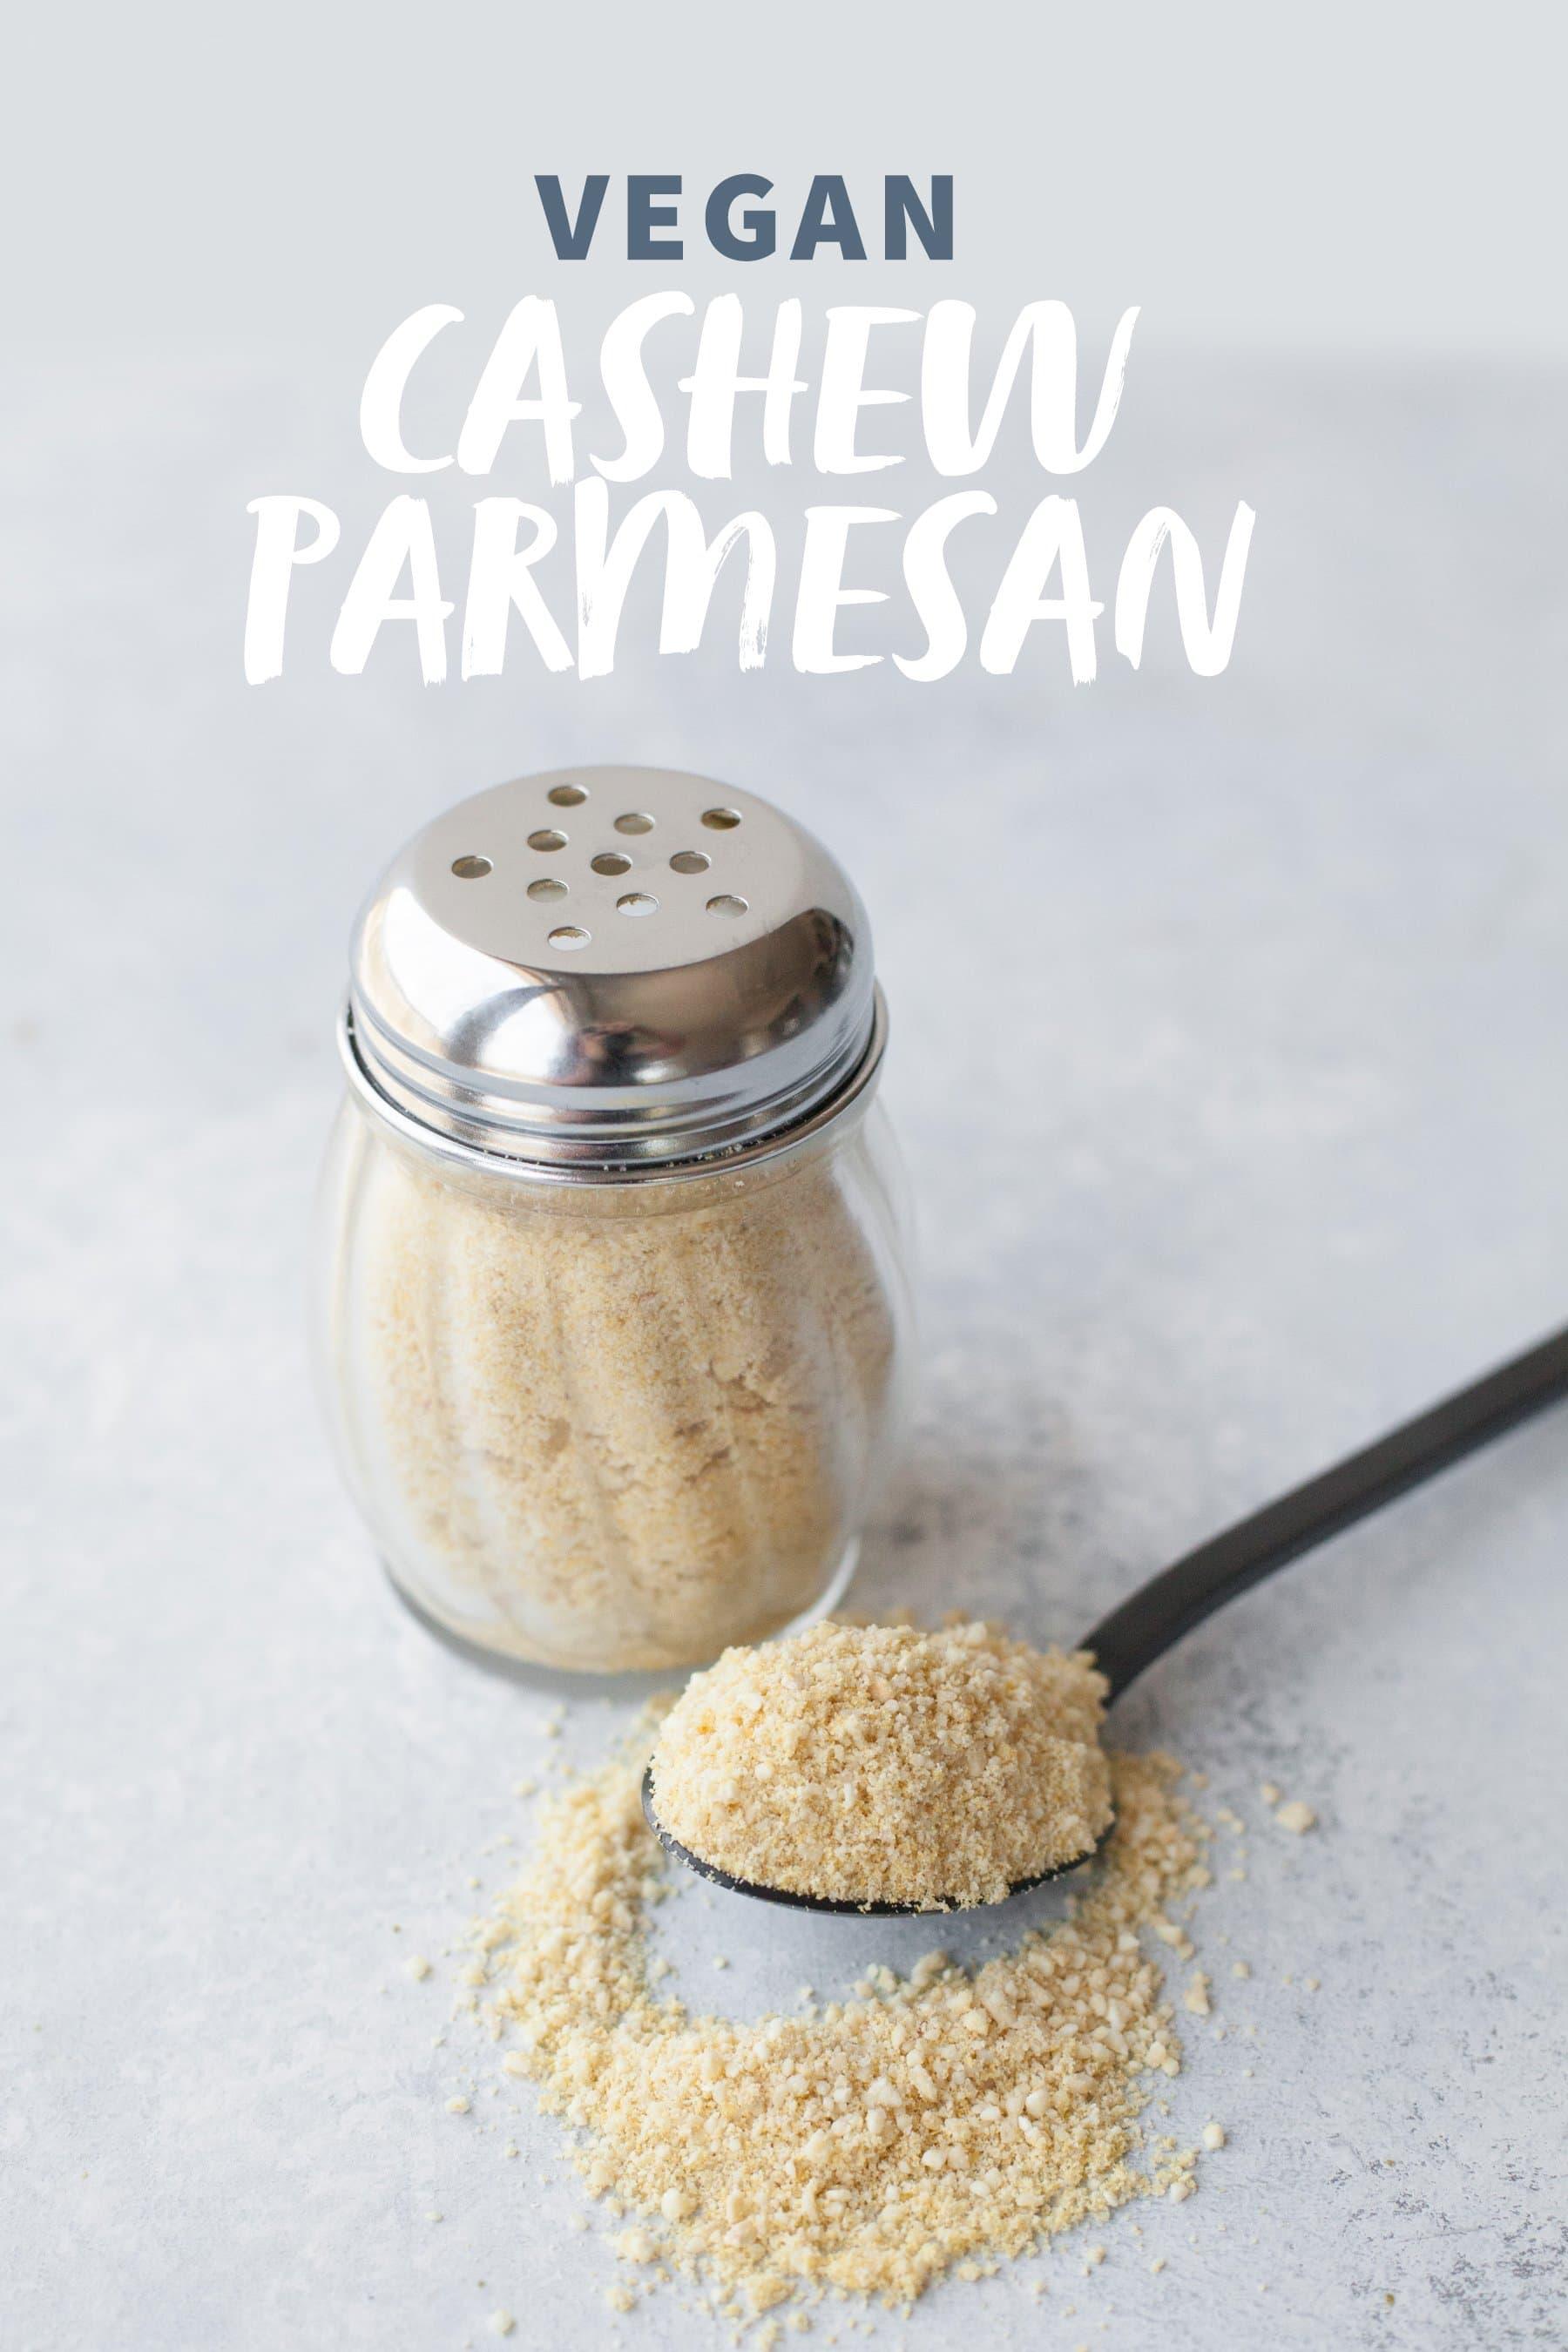 Vegan Cashew Parmesan